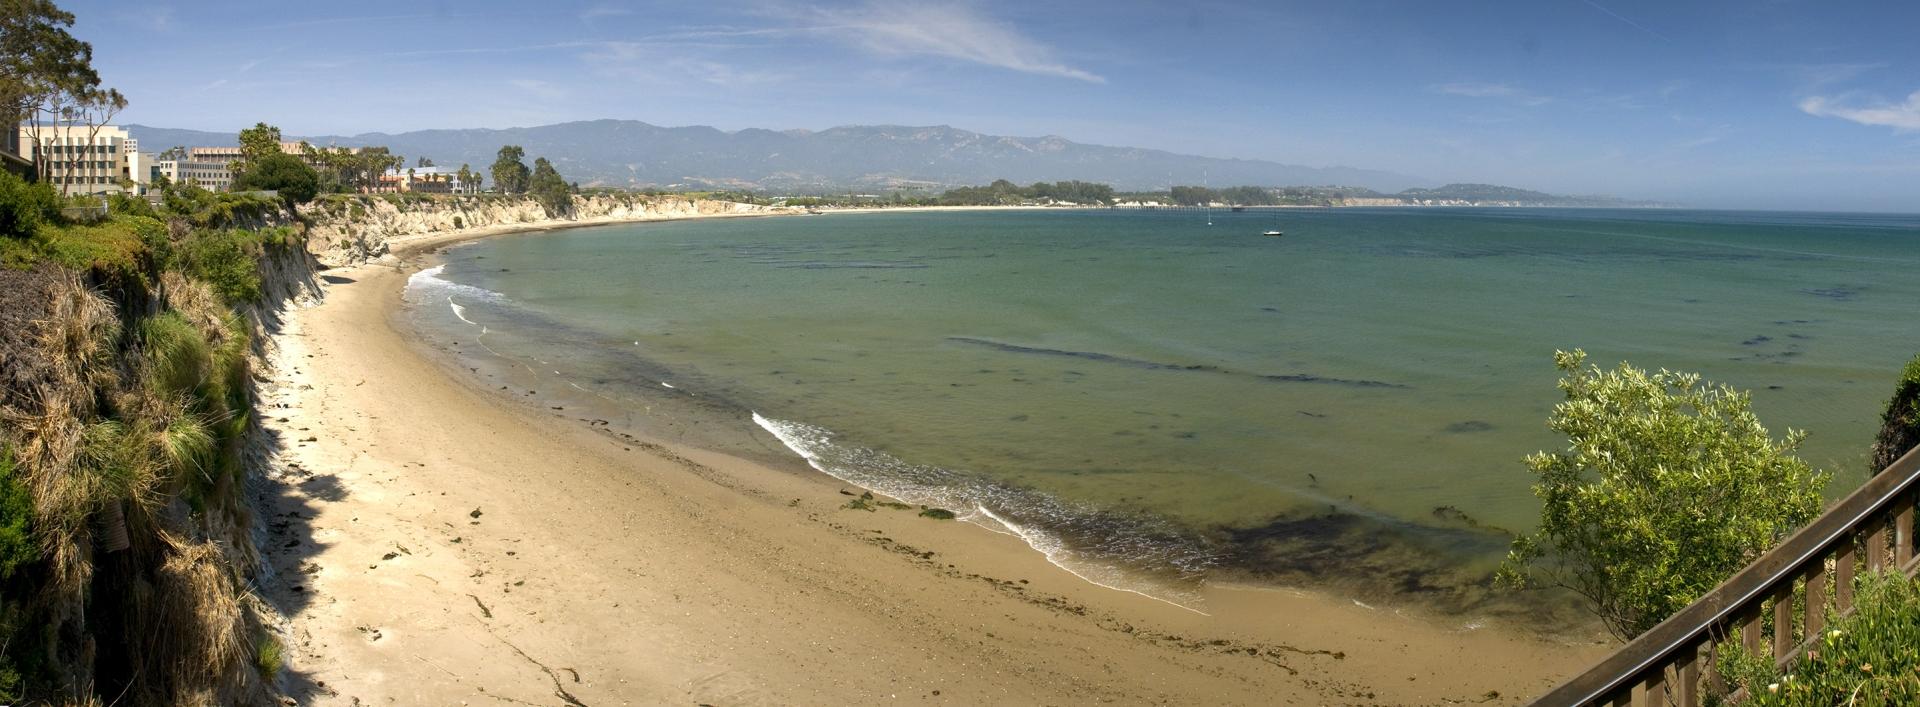 Sandy shoreline and beach